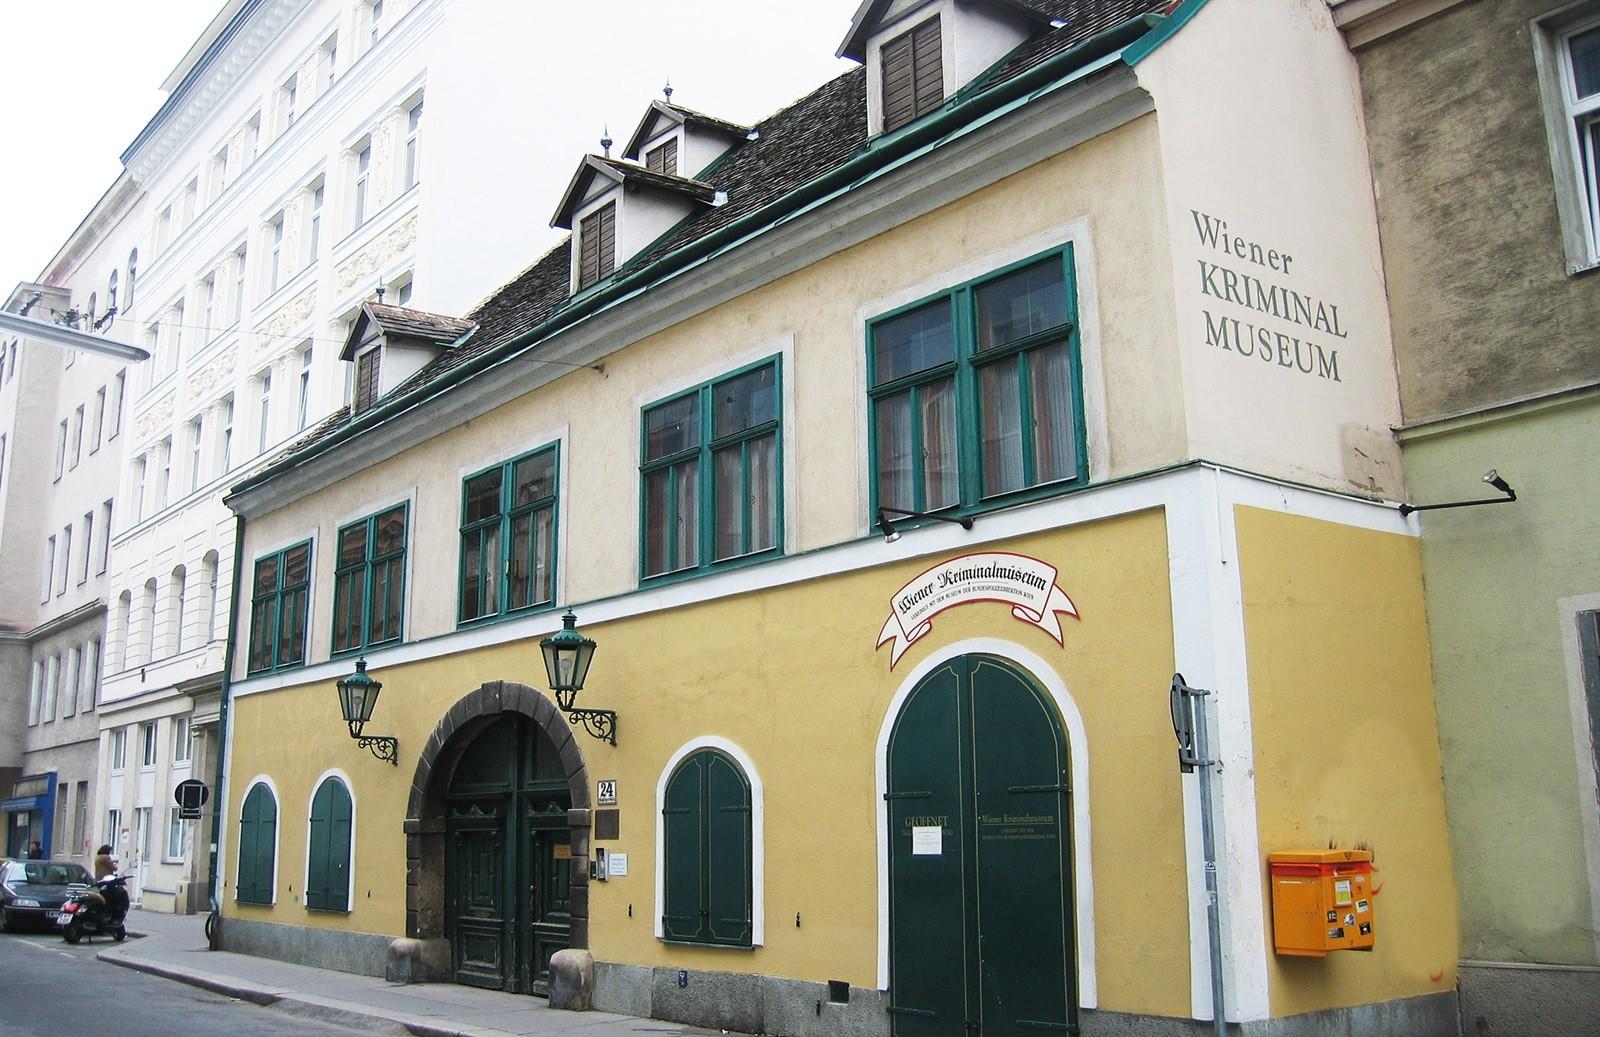 Muzeum kryminalne Das Wiener Kriminalmuseum